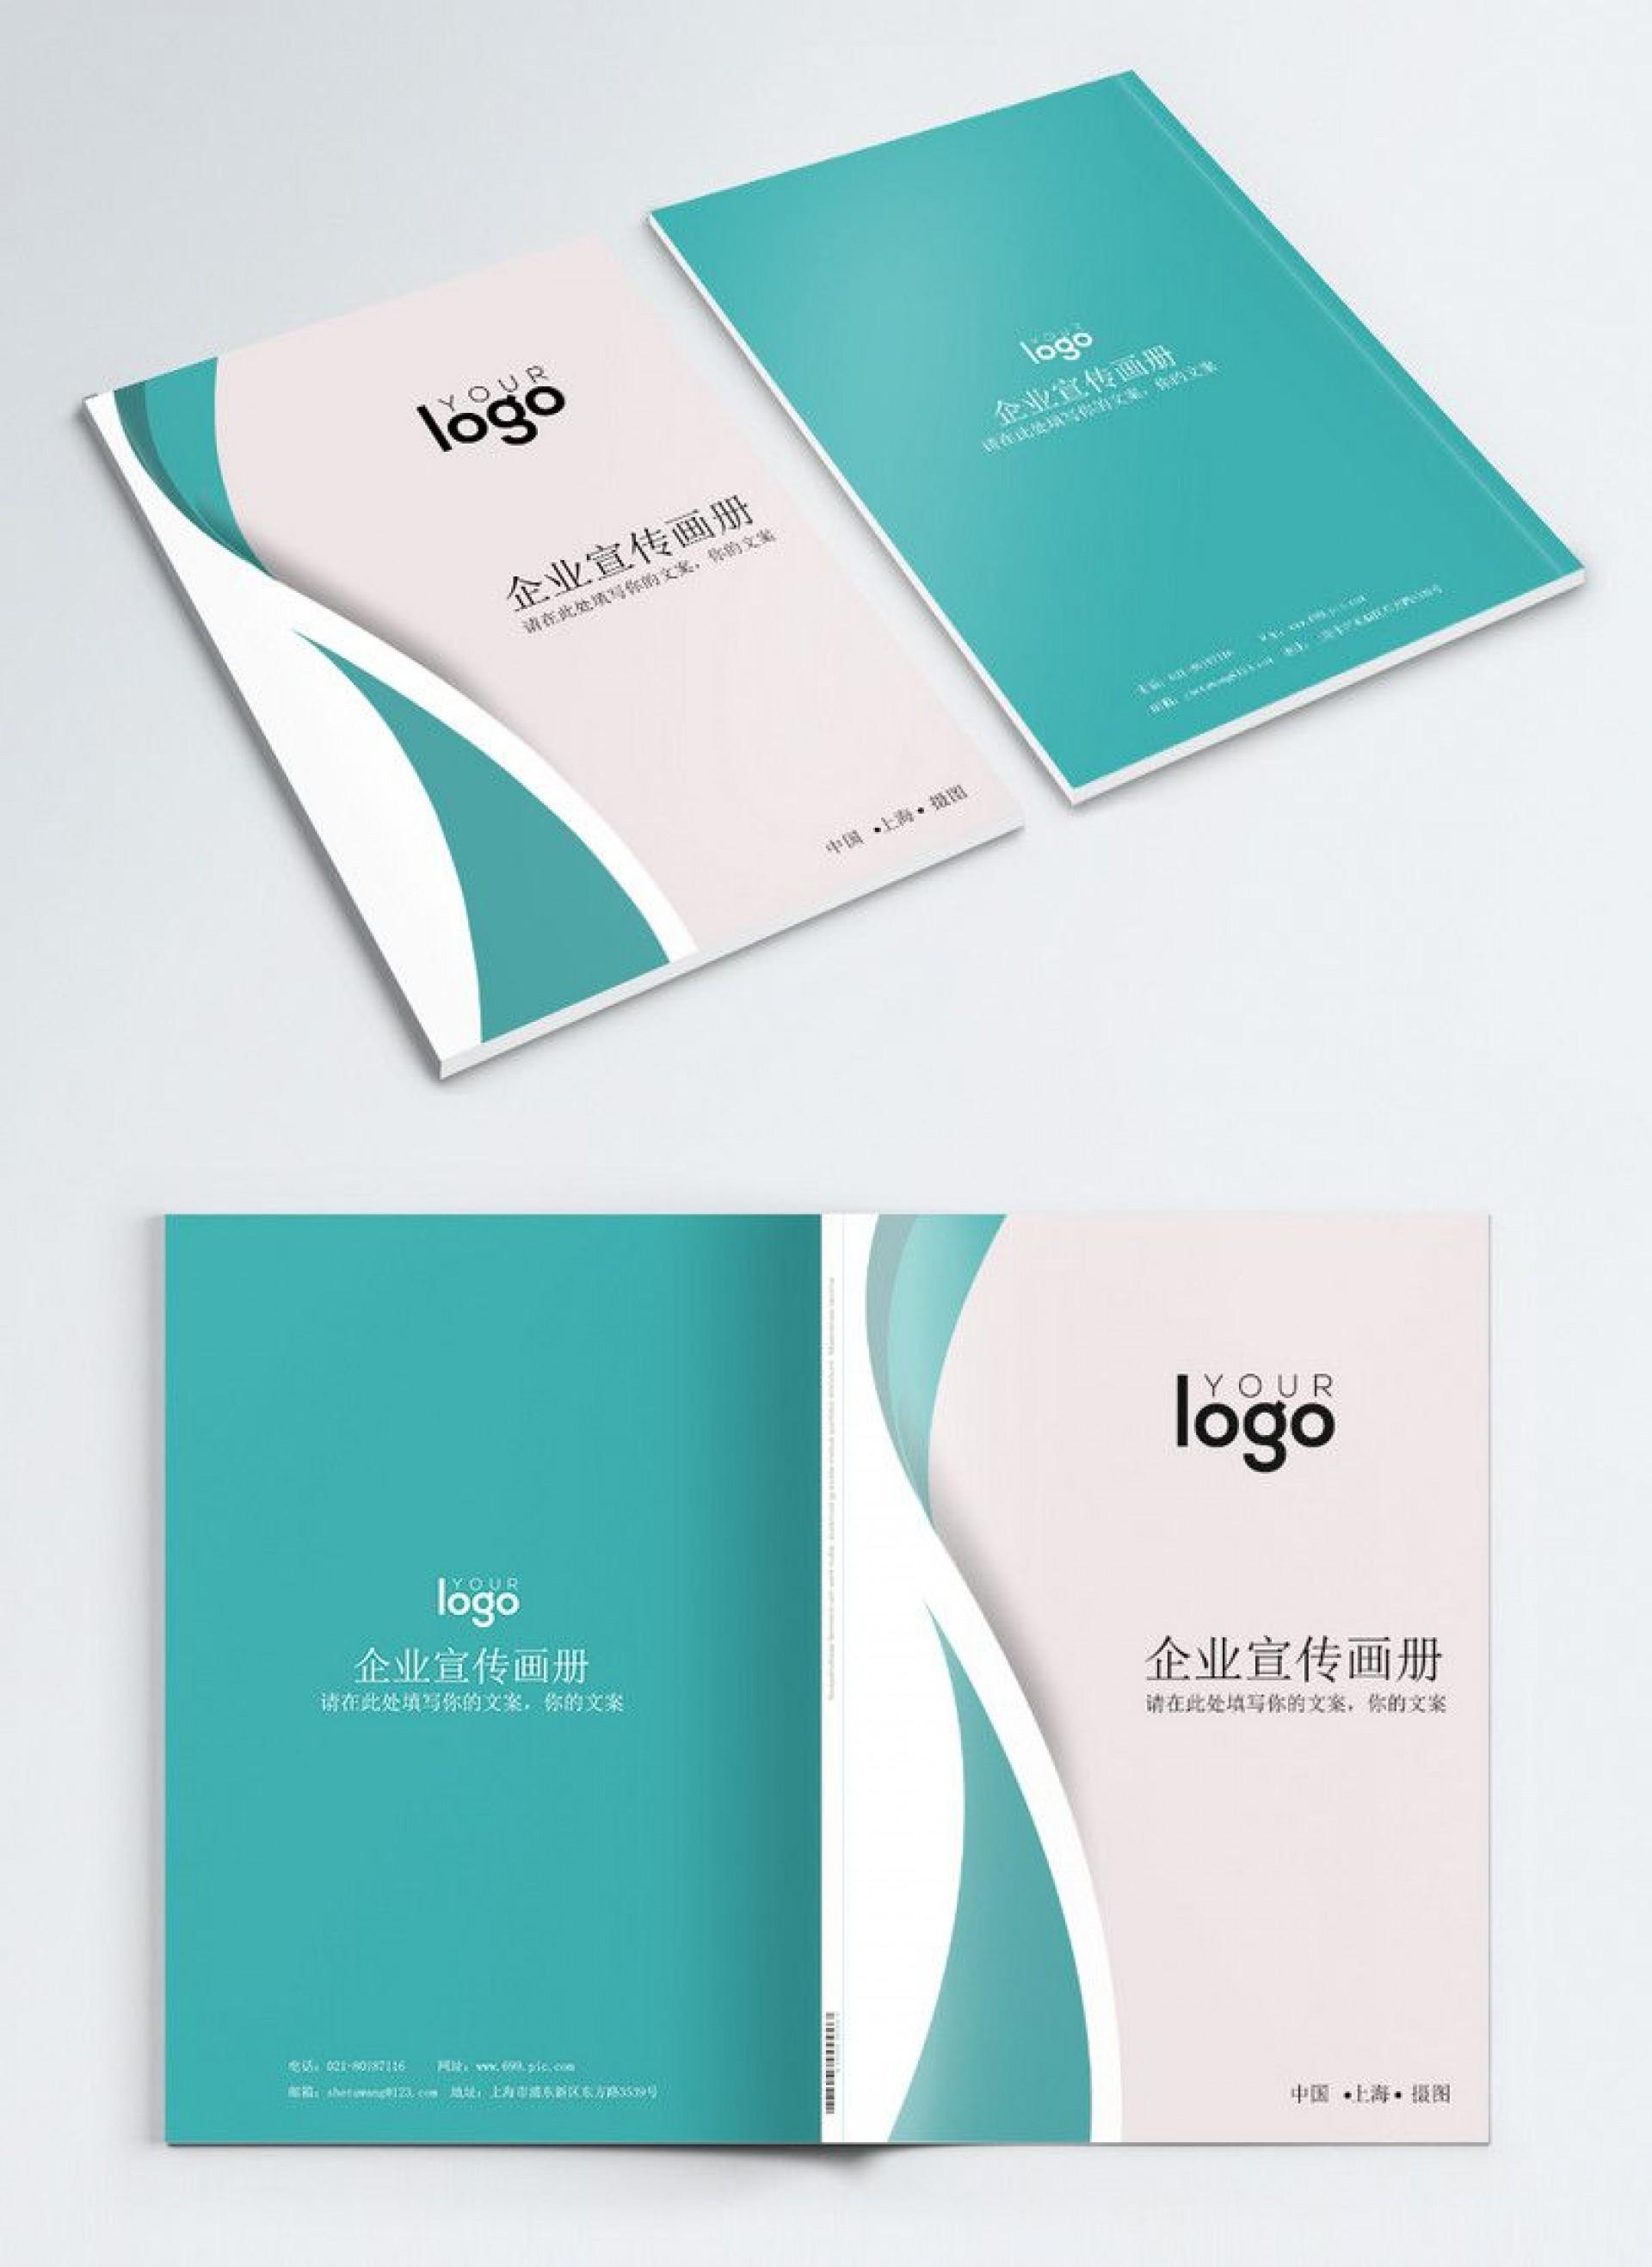 003 Top Book Cover Template Free Download Sample  Illustrator Design Vector Illustration1920